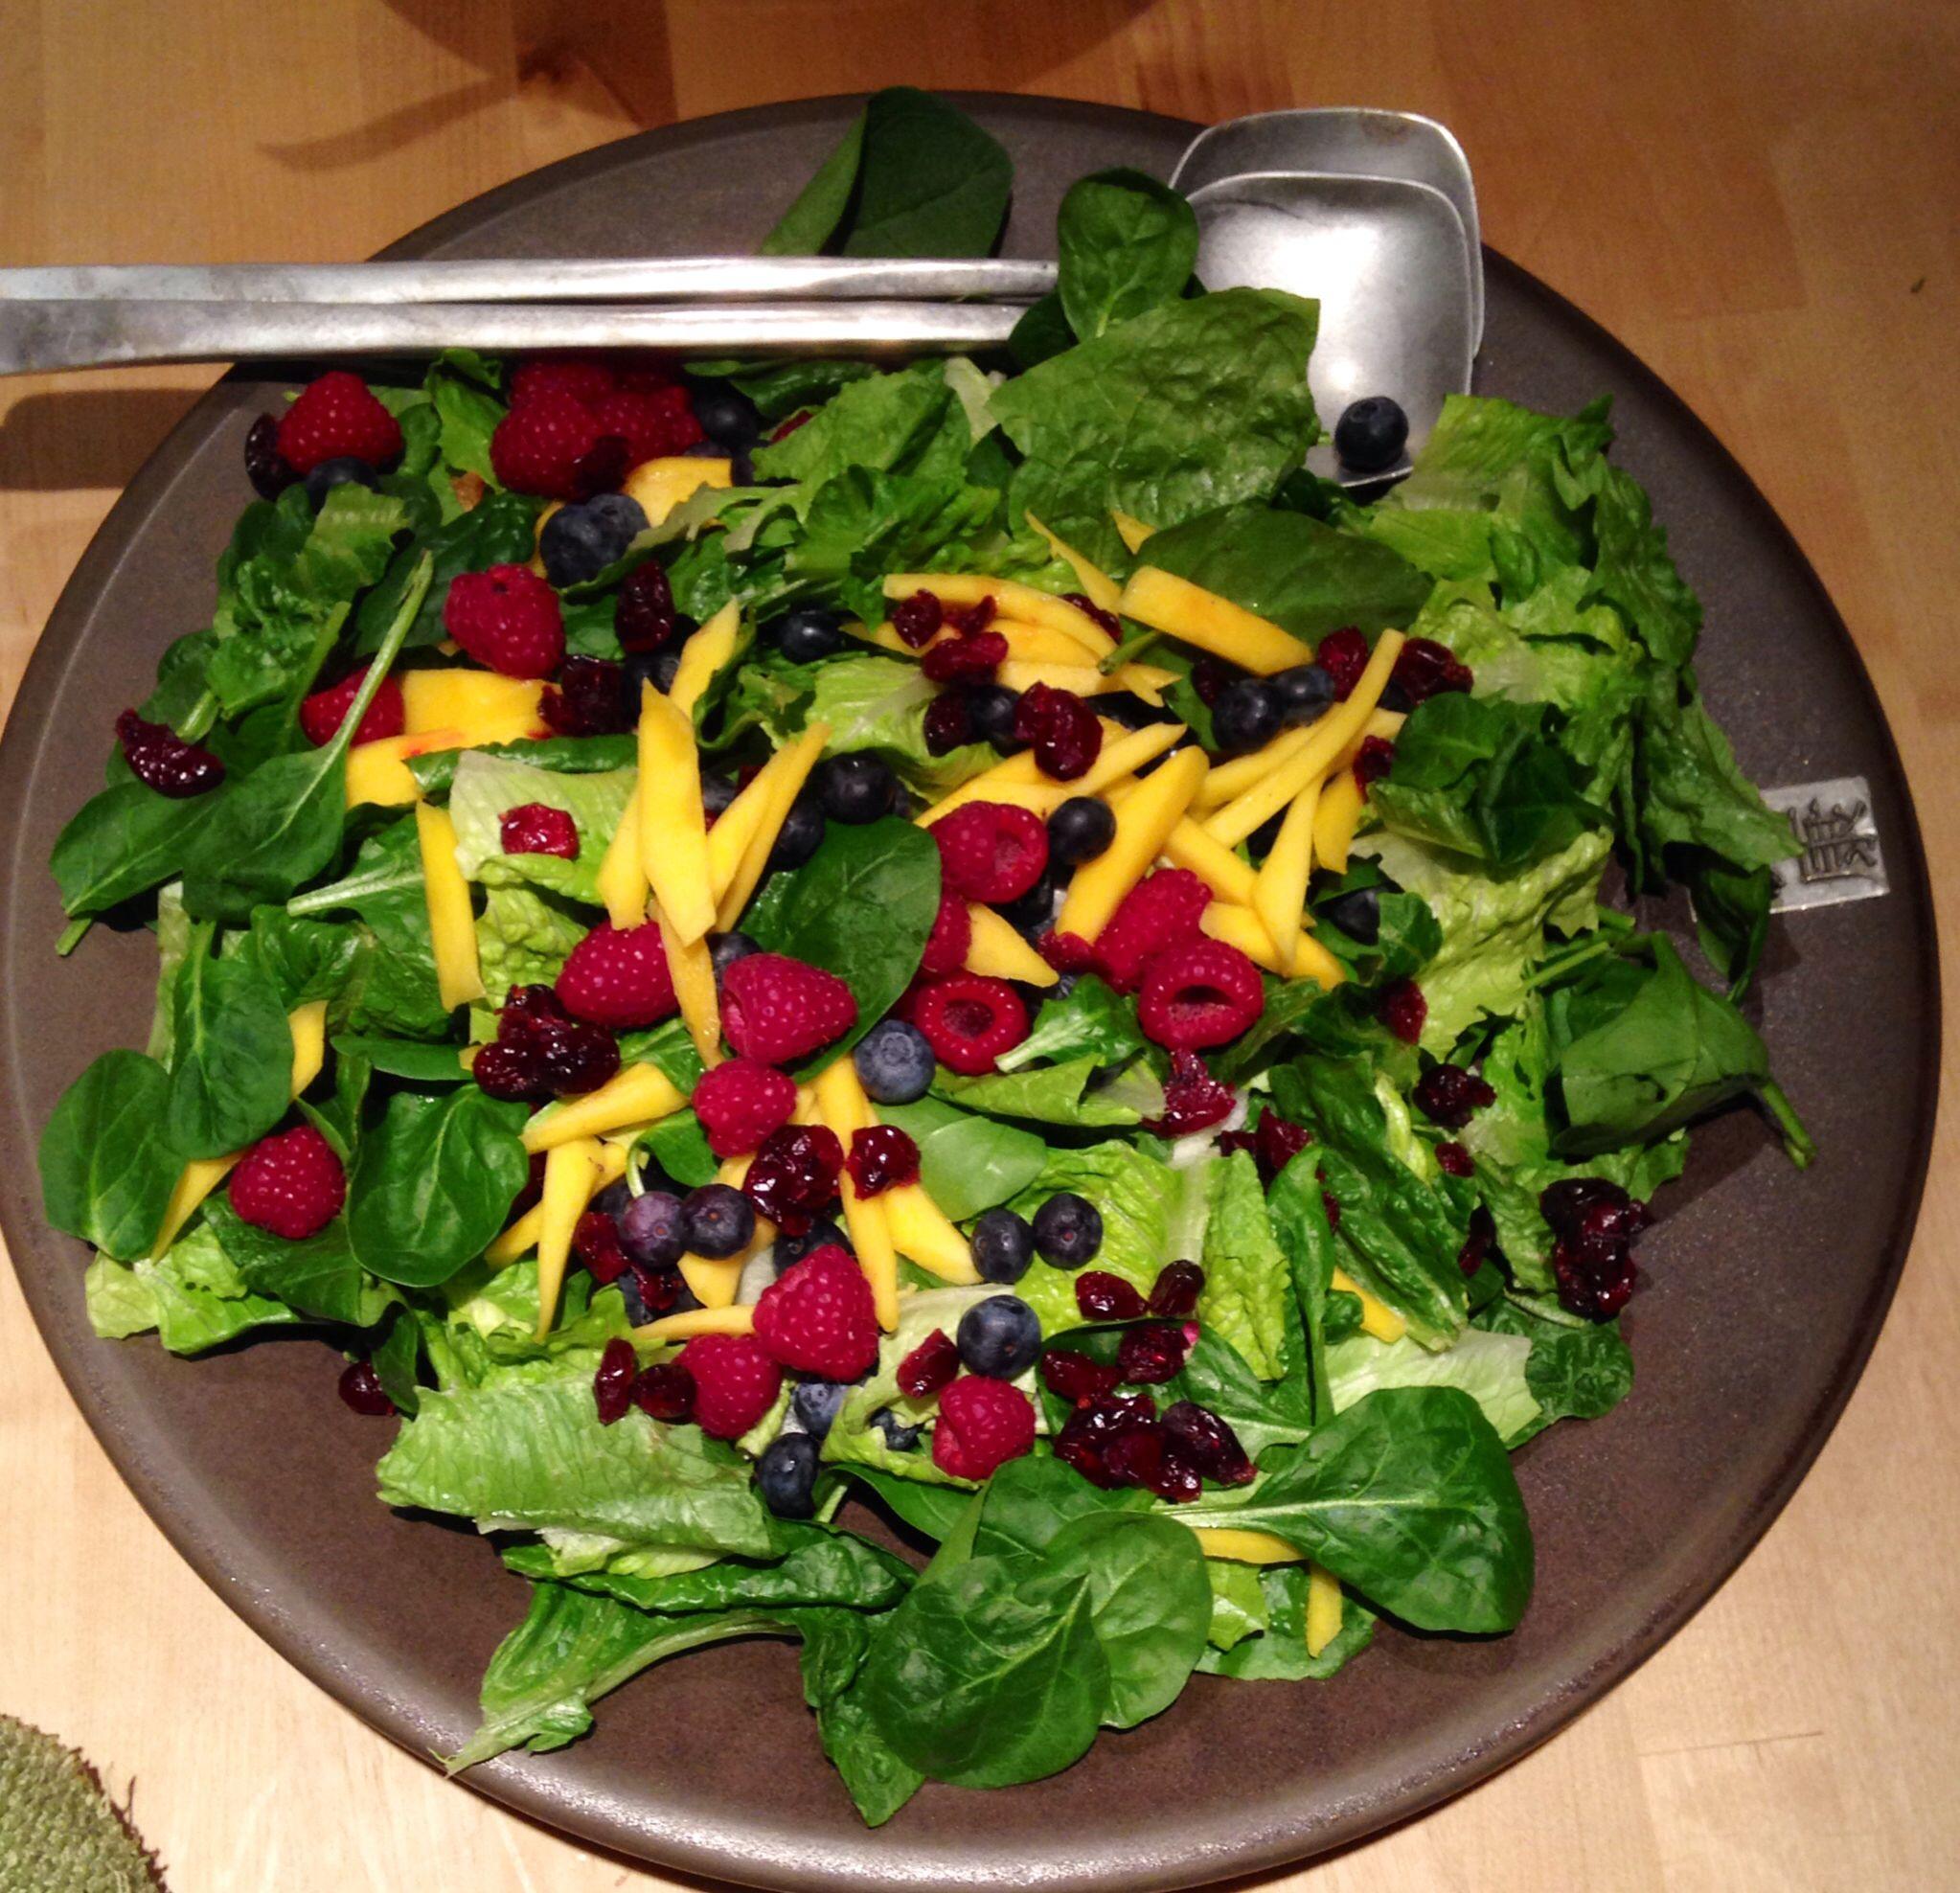 healthy salad -spinach, mango, lettuce, raspberries, dried cranberries, blueberries, vinaigrette dressing  -delicious!